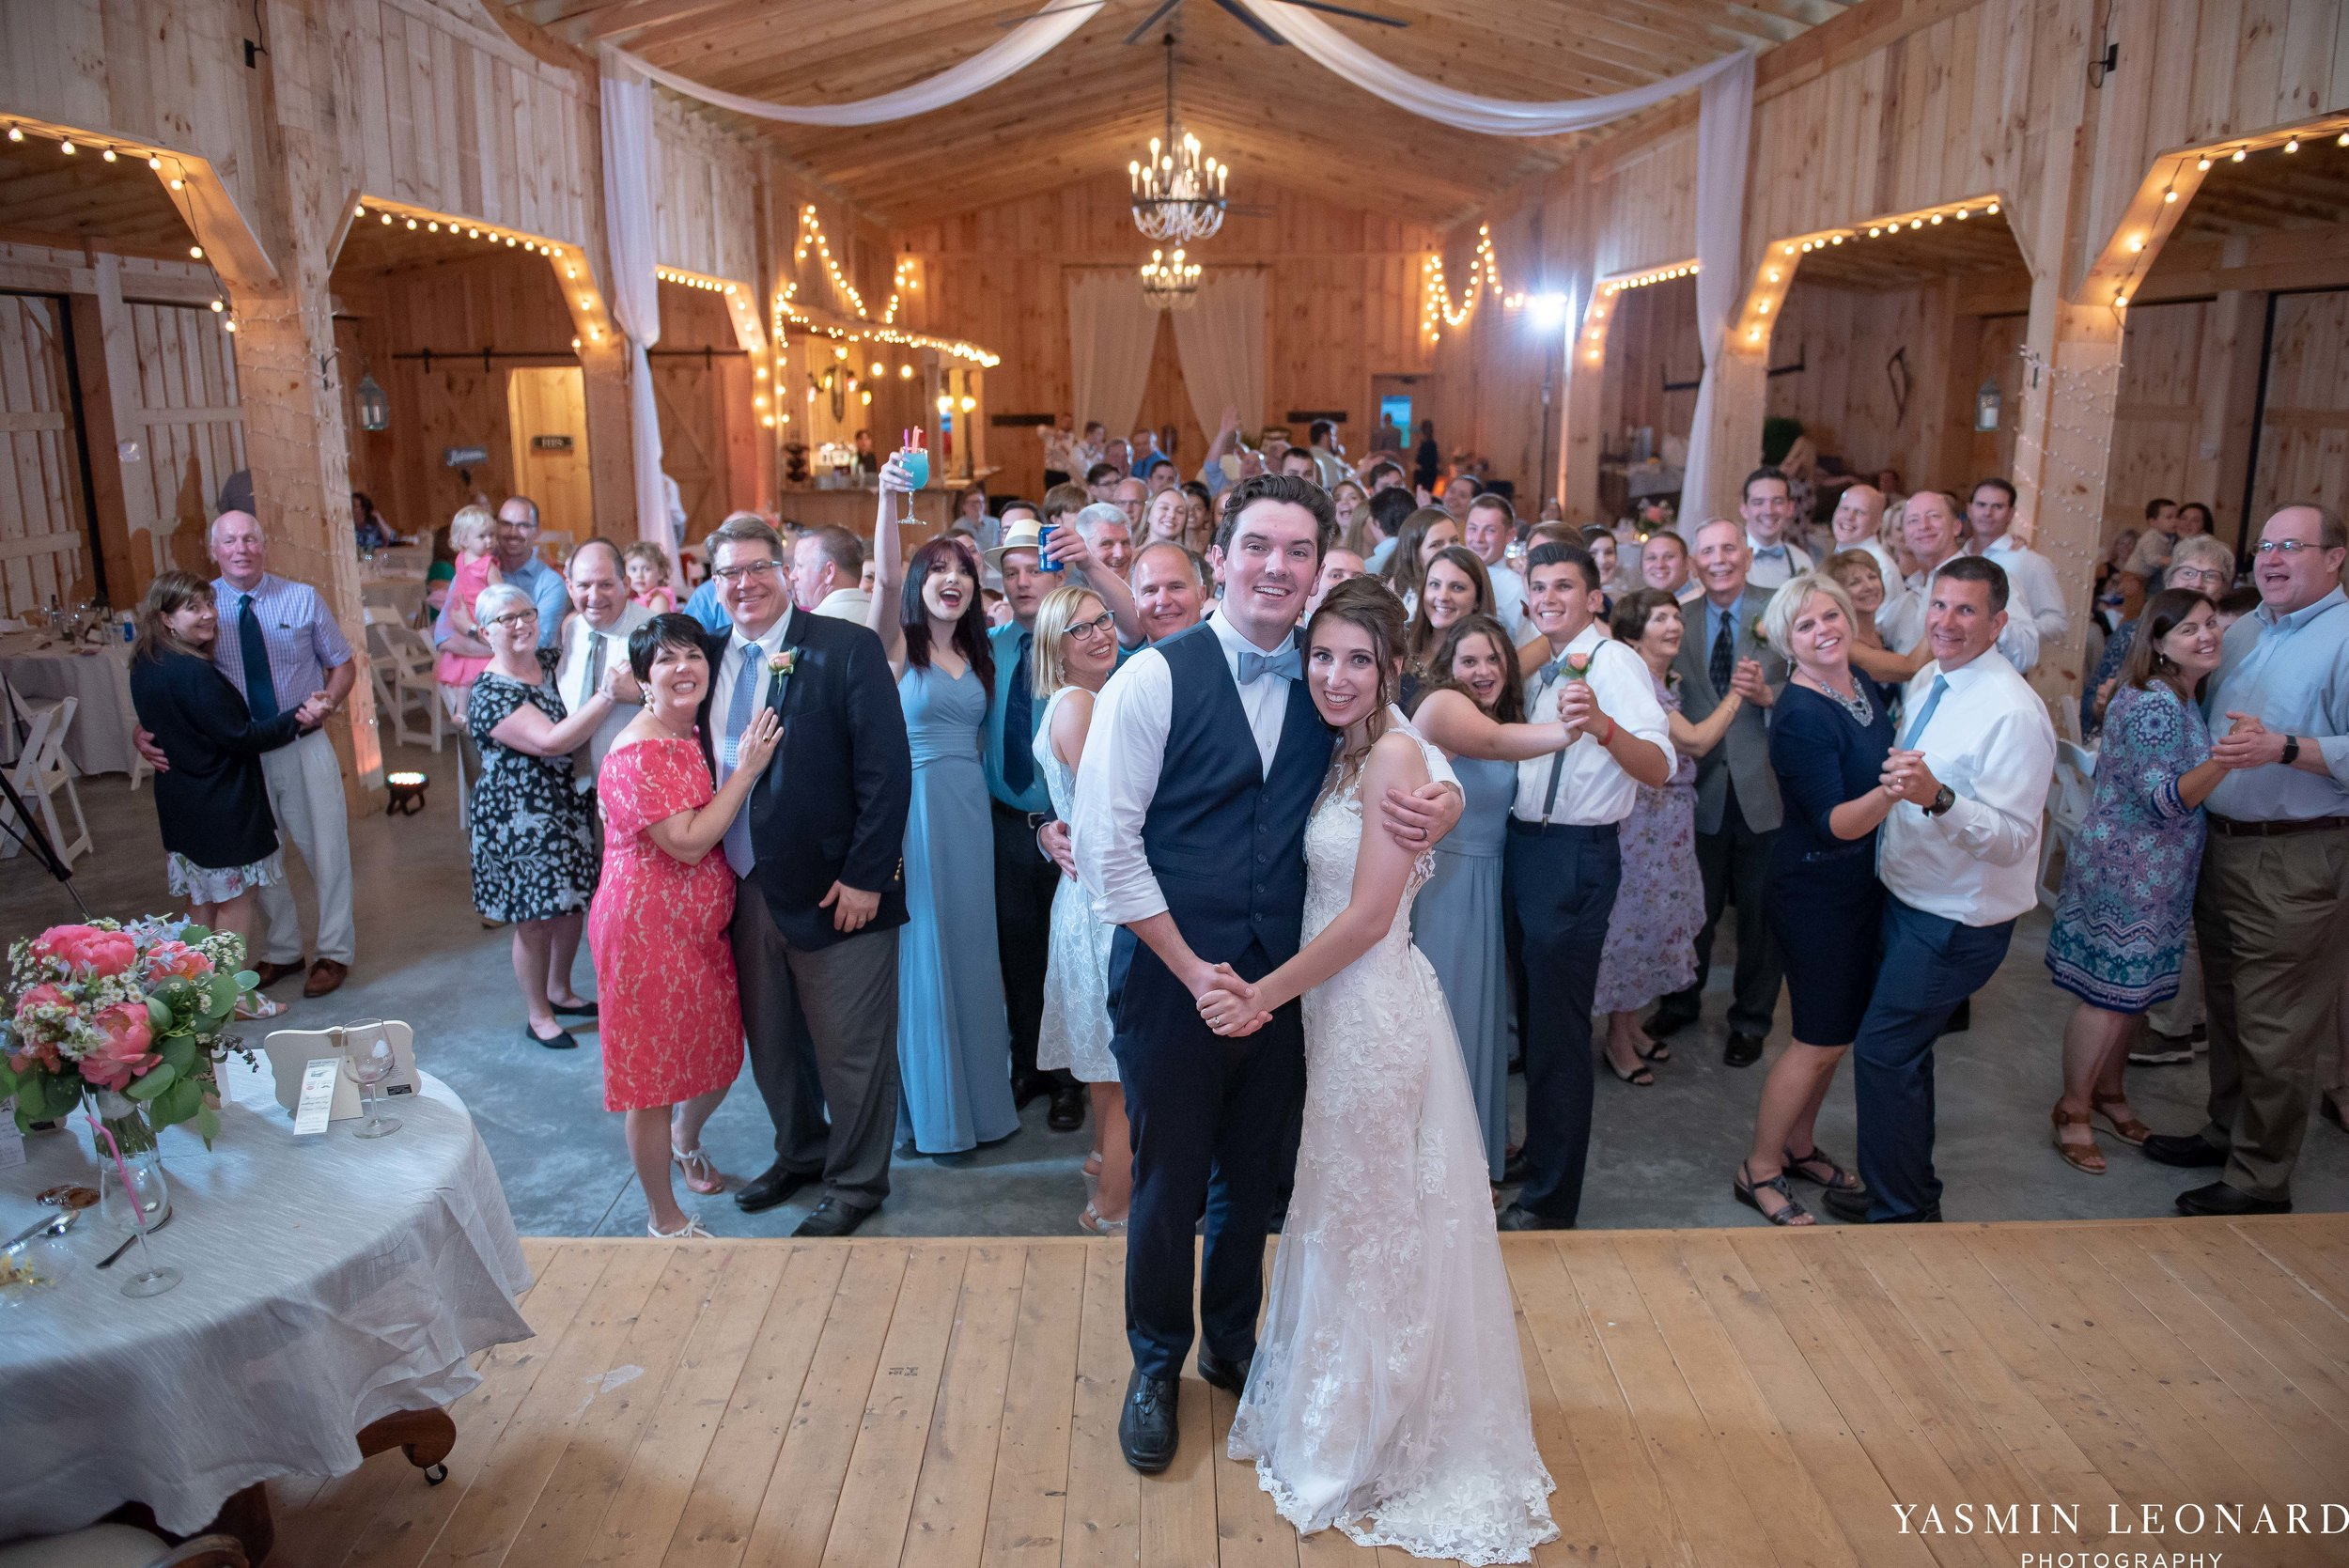 Old Homeplace Vineyard - NC Weddings - Outdoor Summer Weddings - Peony Boutique - Vineyard Wedding - NC Photographer - Yasmin Leonard Photography-73.jpg